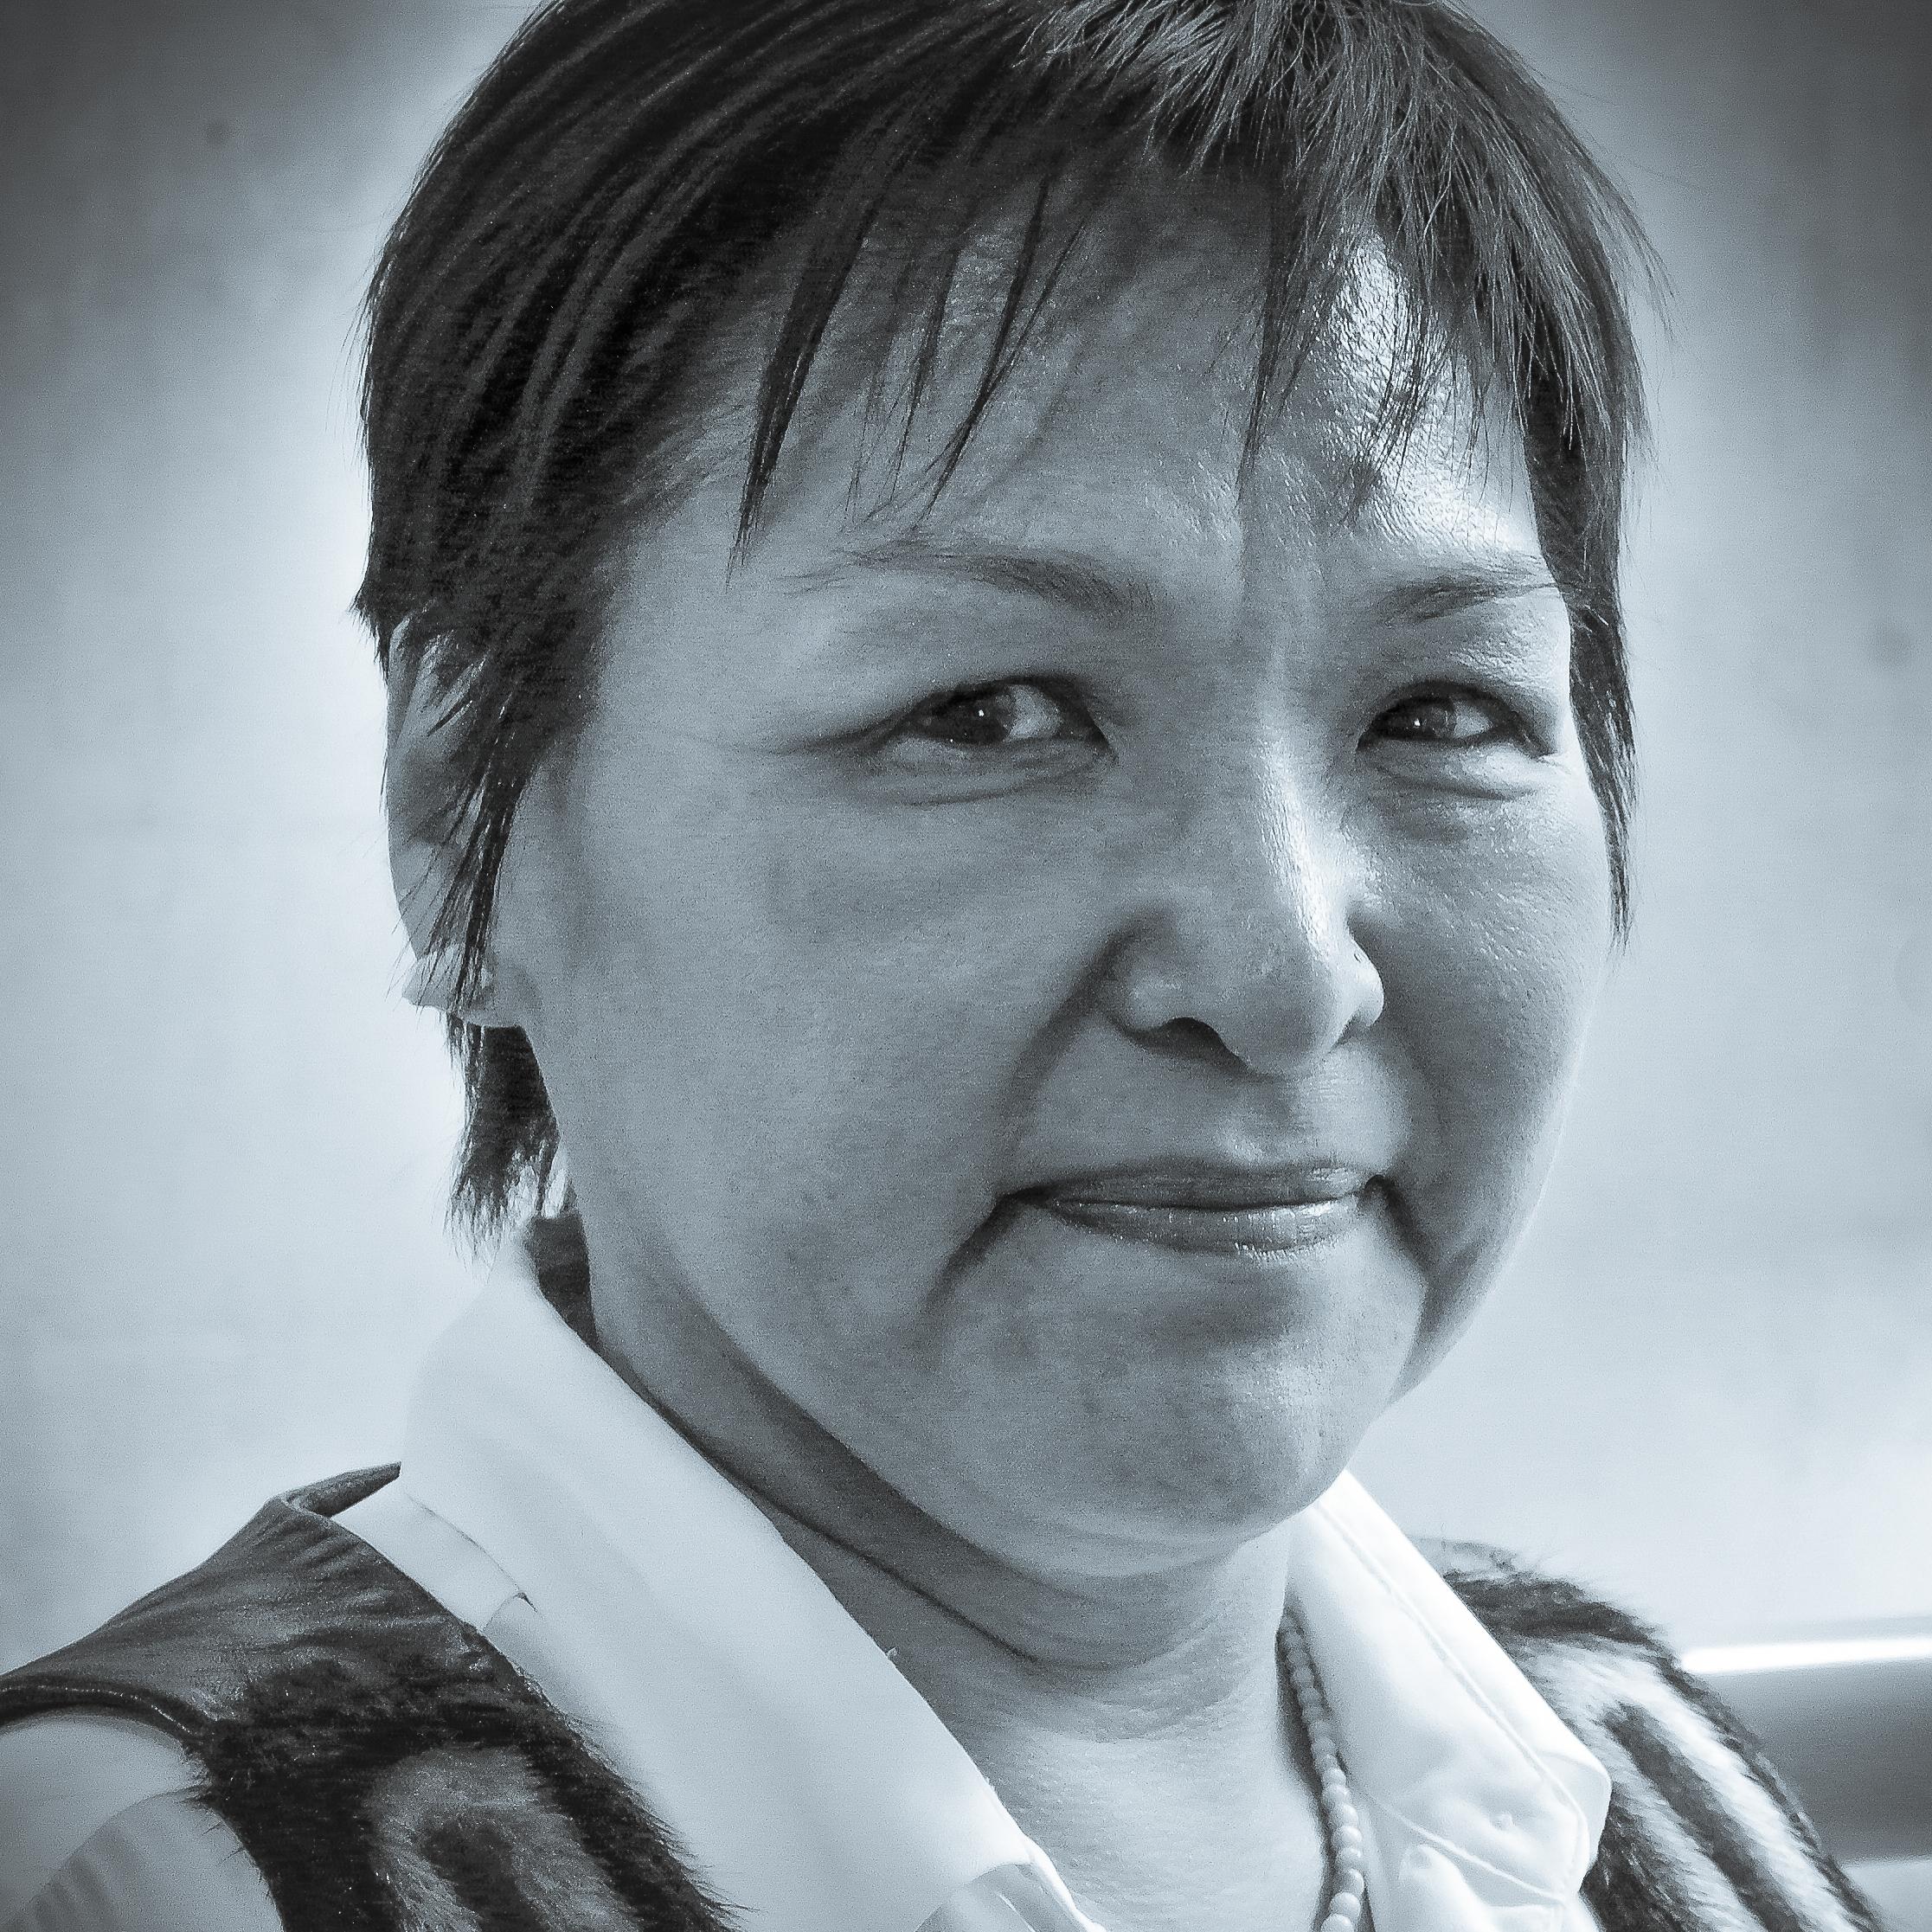 Okalik Eegeesiak - Former Chairman of the ICC, Inuit Circumpolar Council.